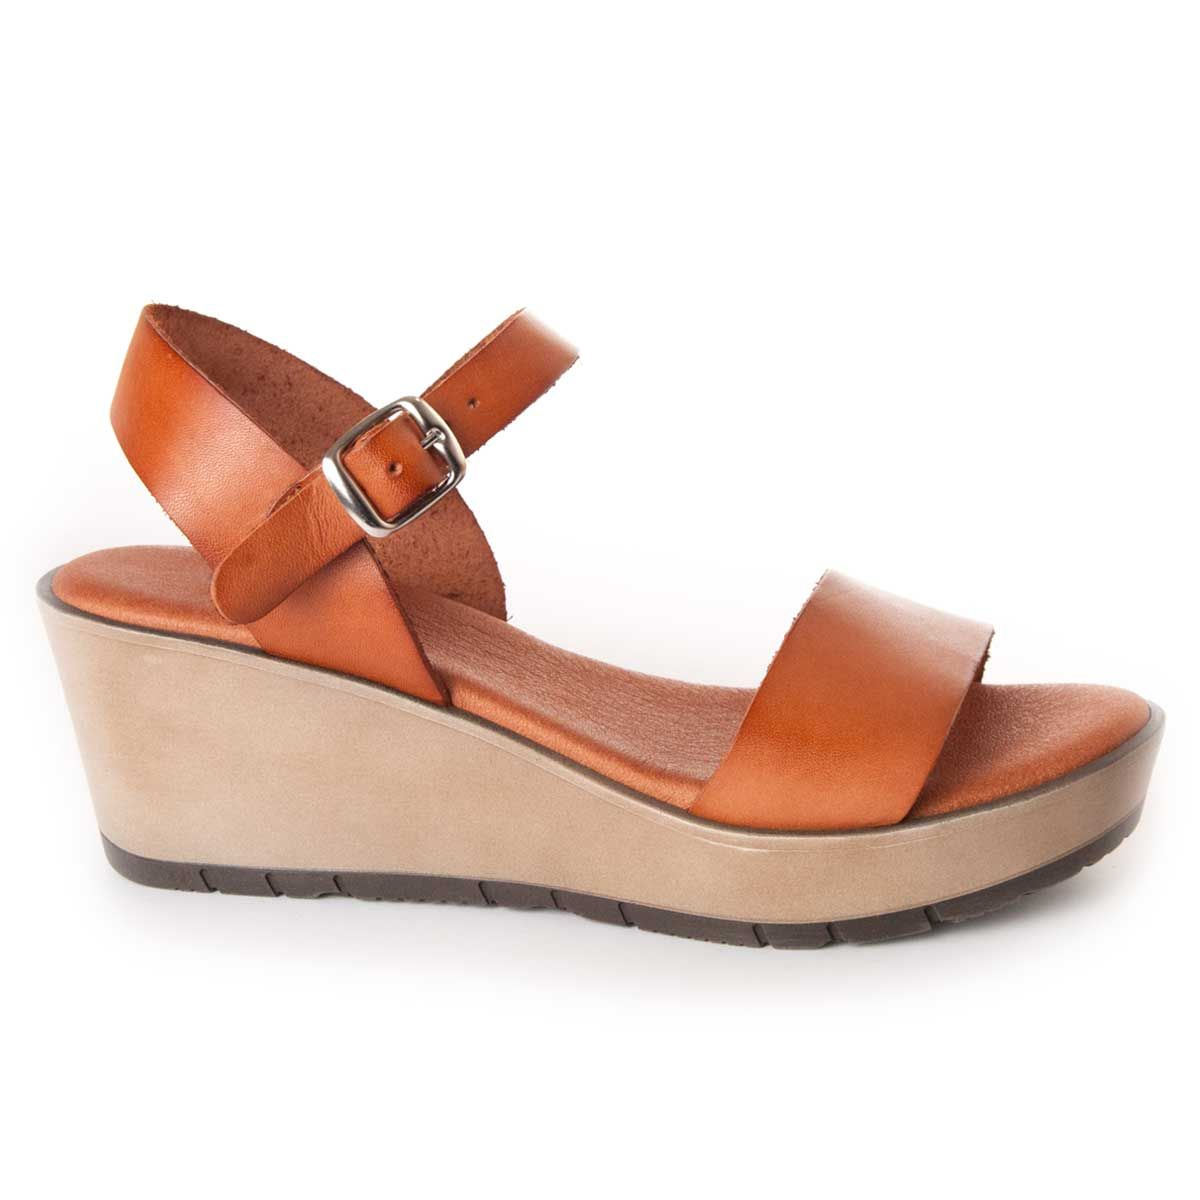 Leindia Wedge Sandal in Camel